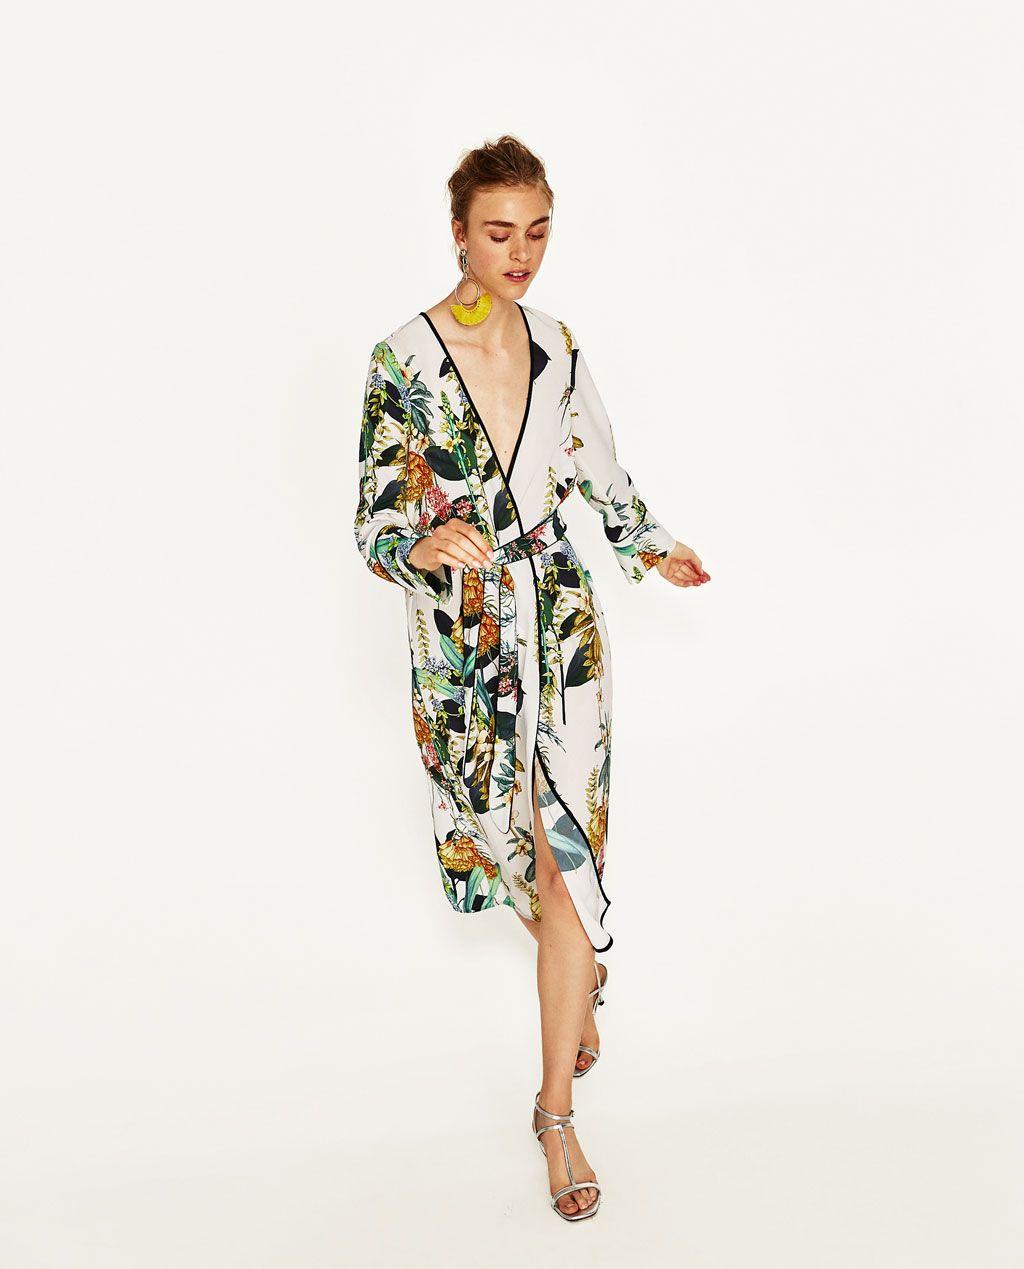 42e26a99544 LONG PRINTED KIMONO-DRESSES-WOMAN-COLLECTION AW/17 | ZARA United States